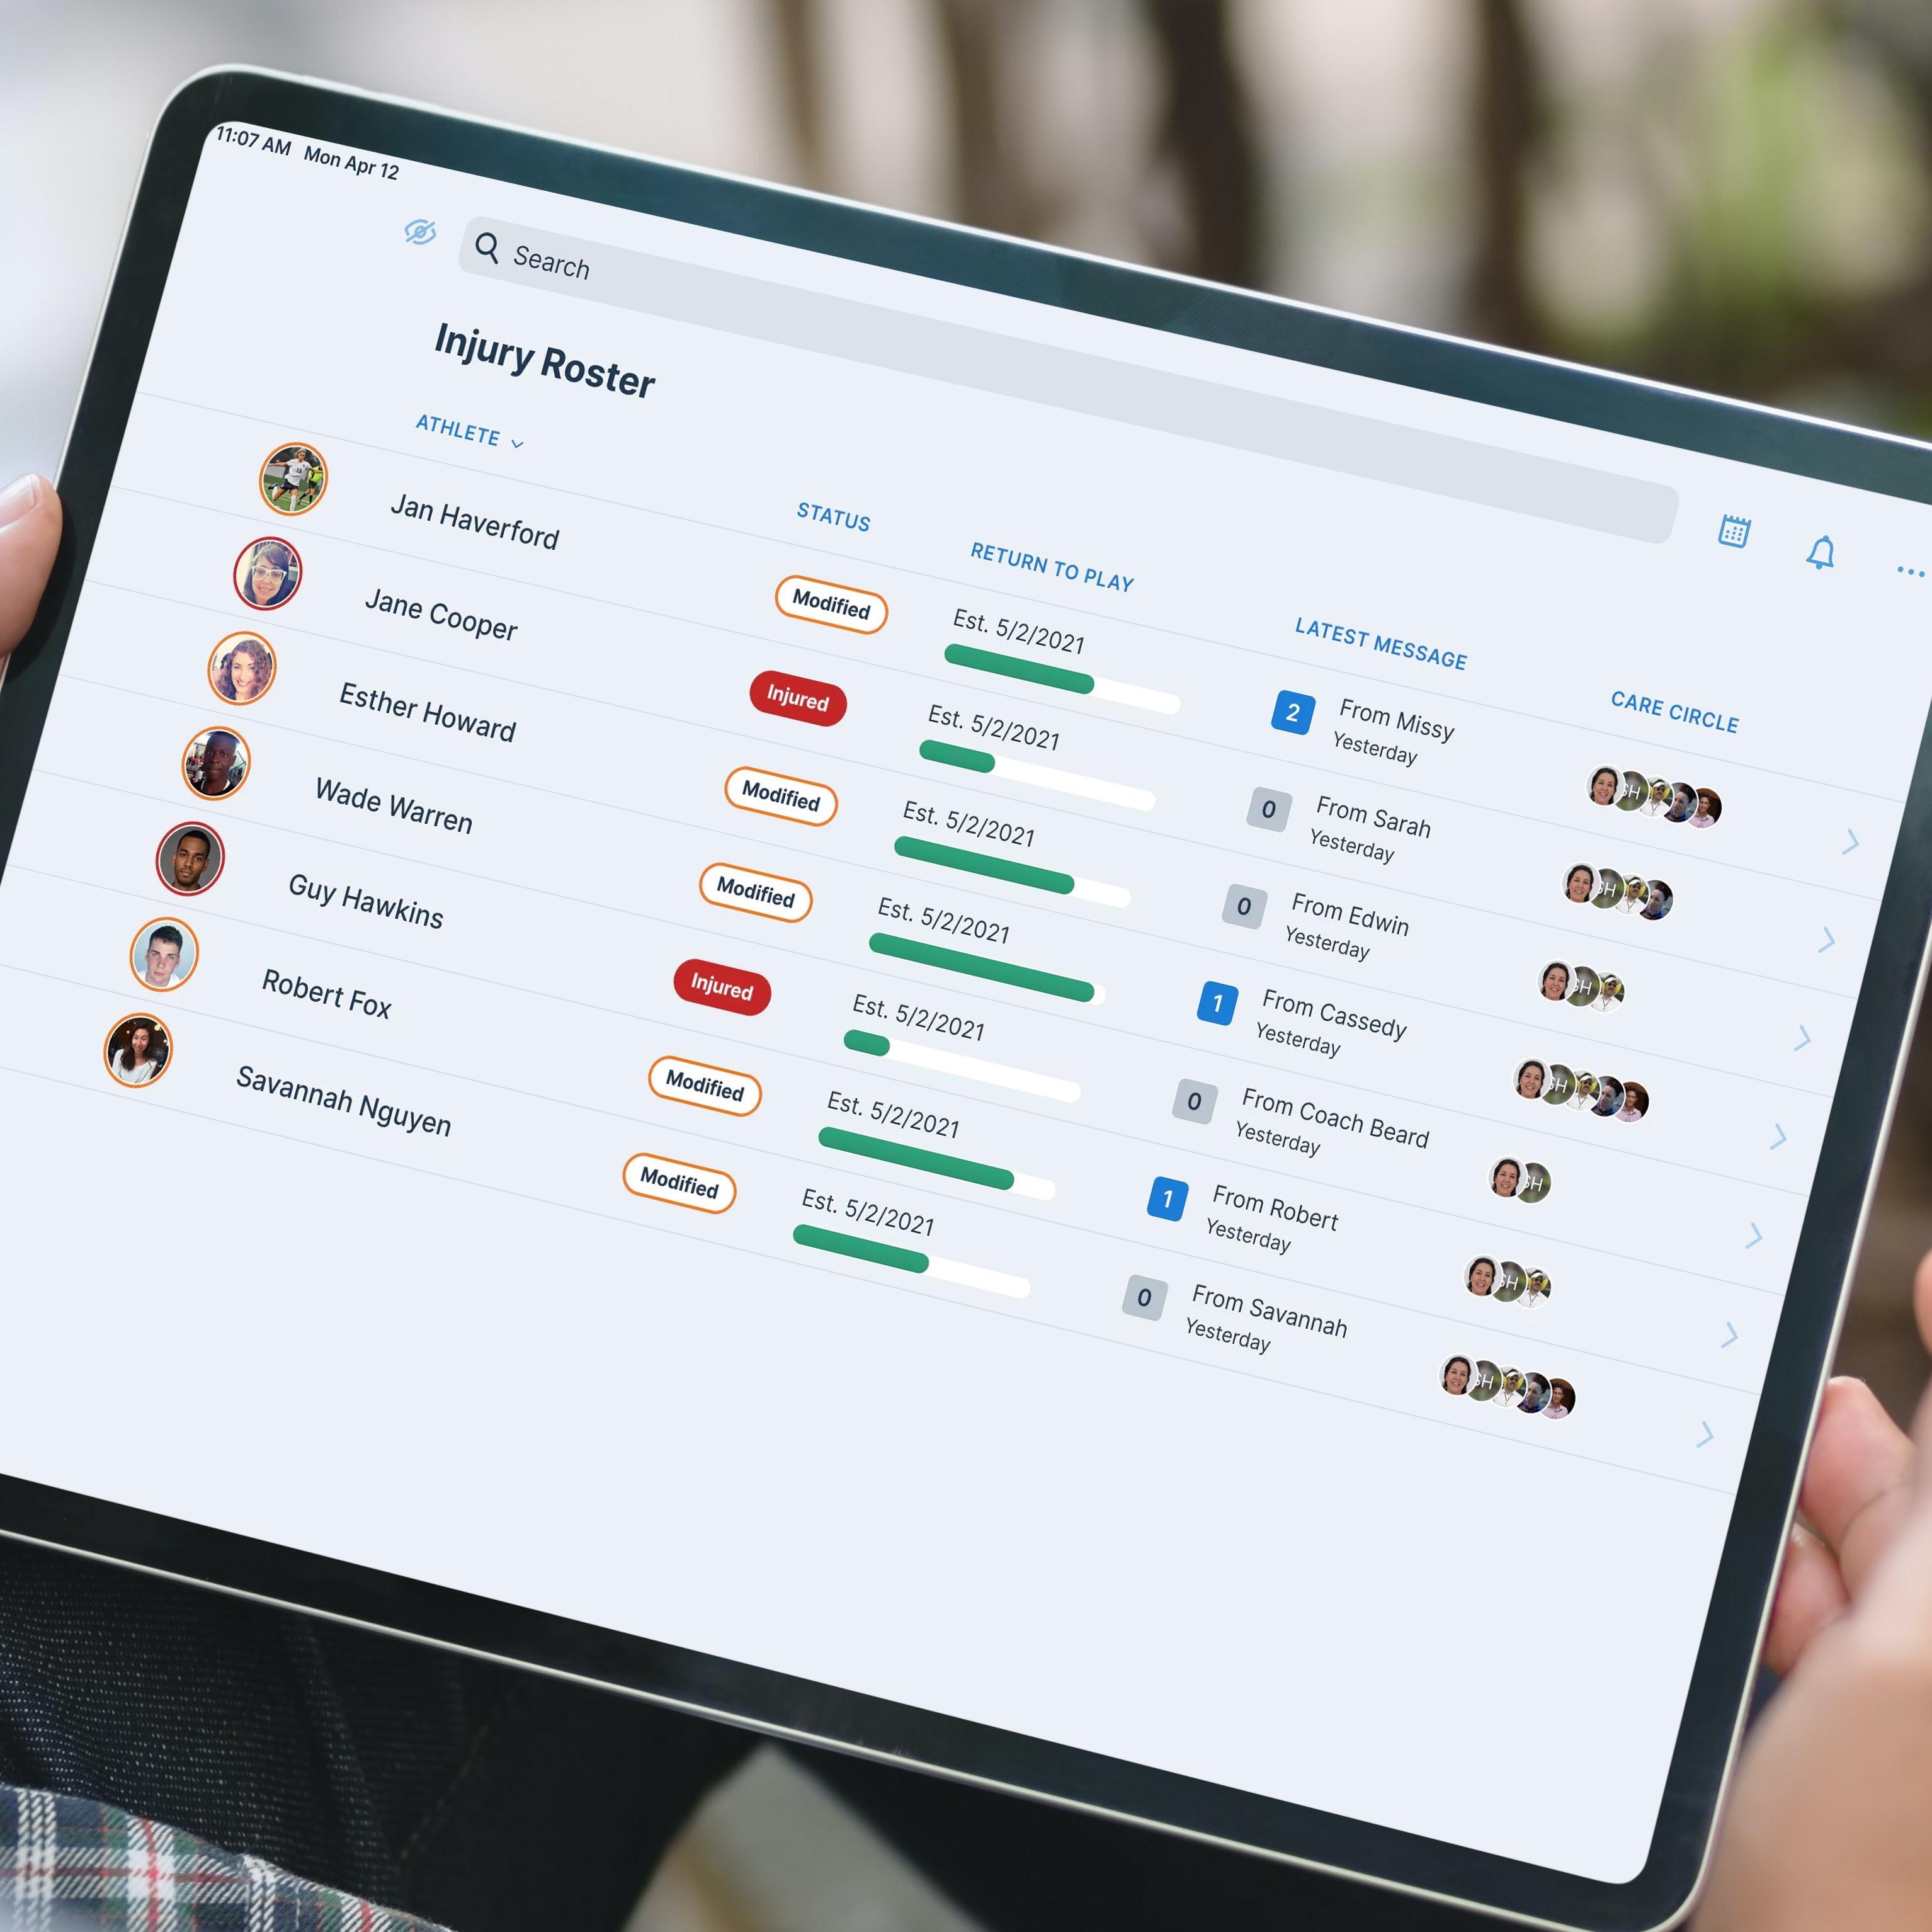 iPad with Veld interface